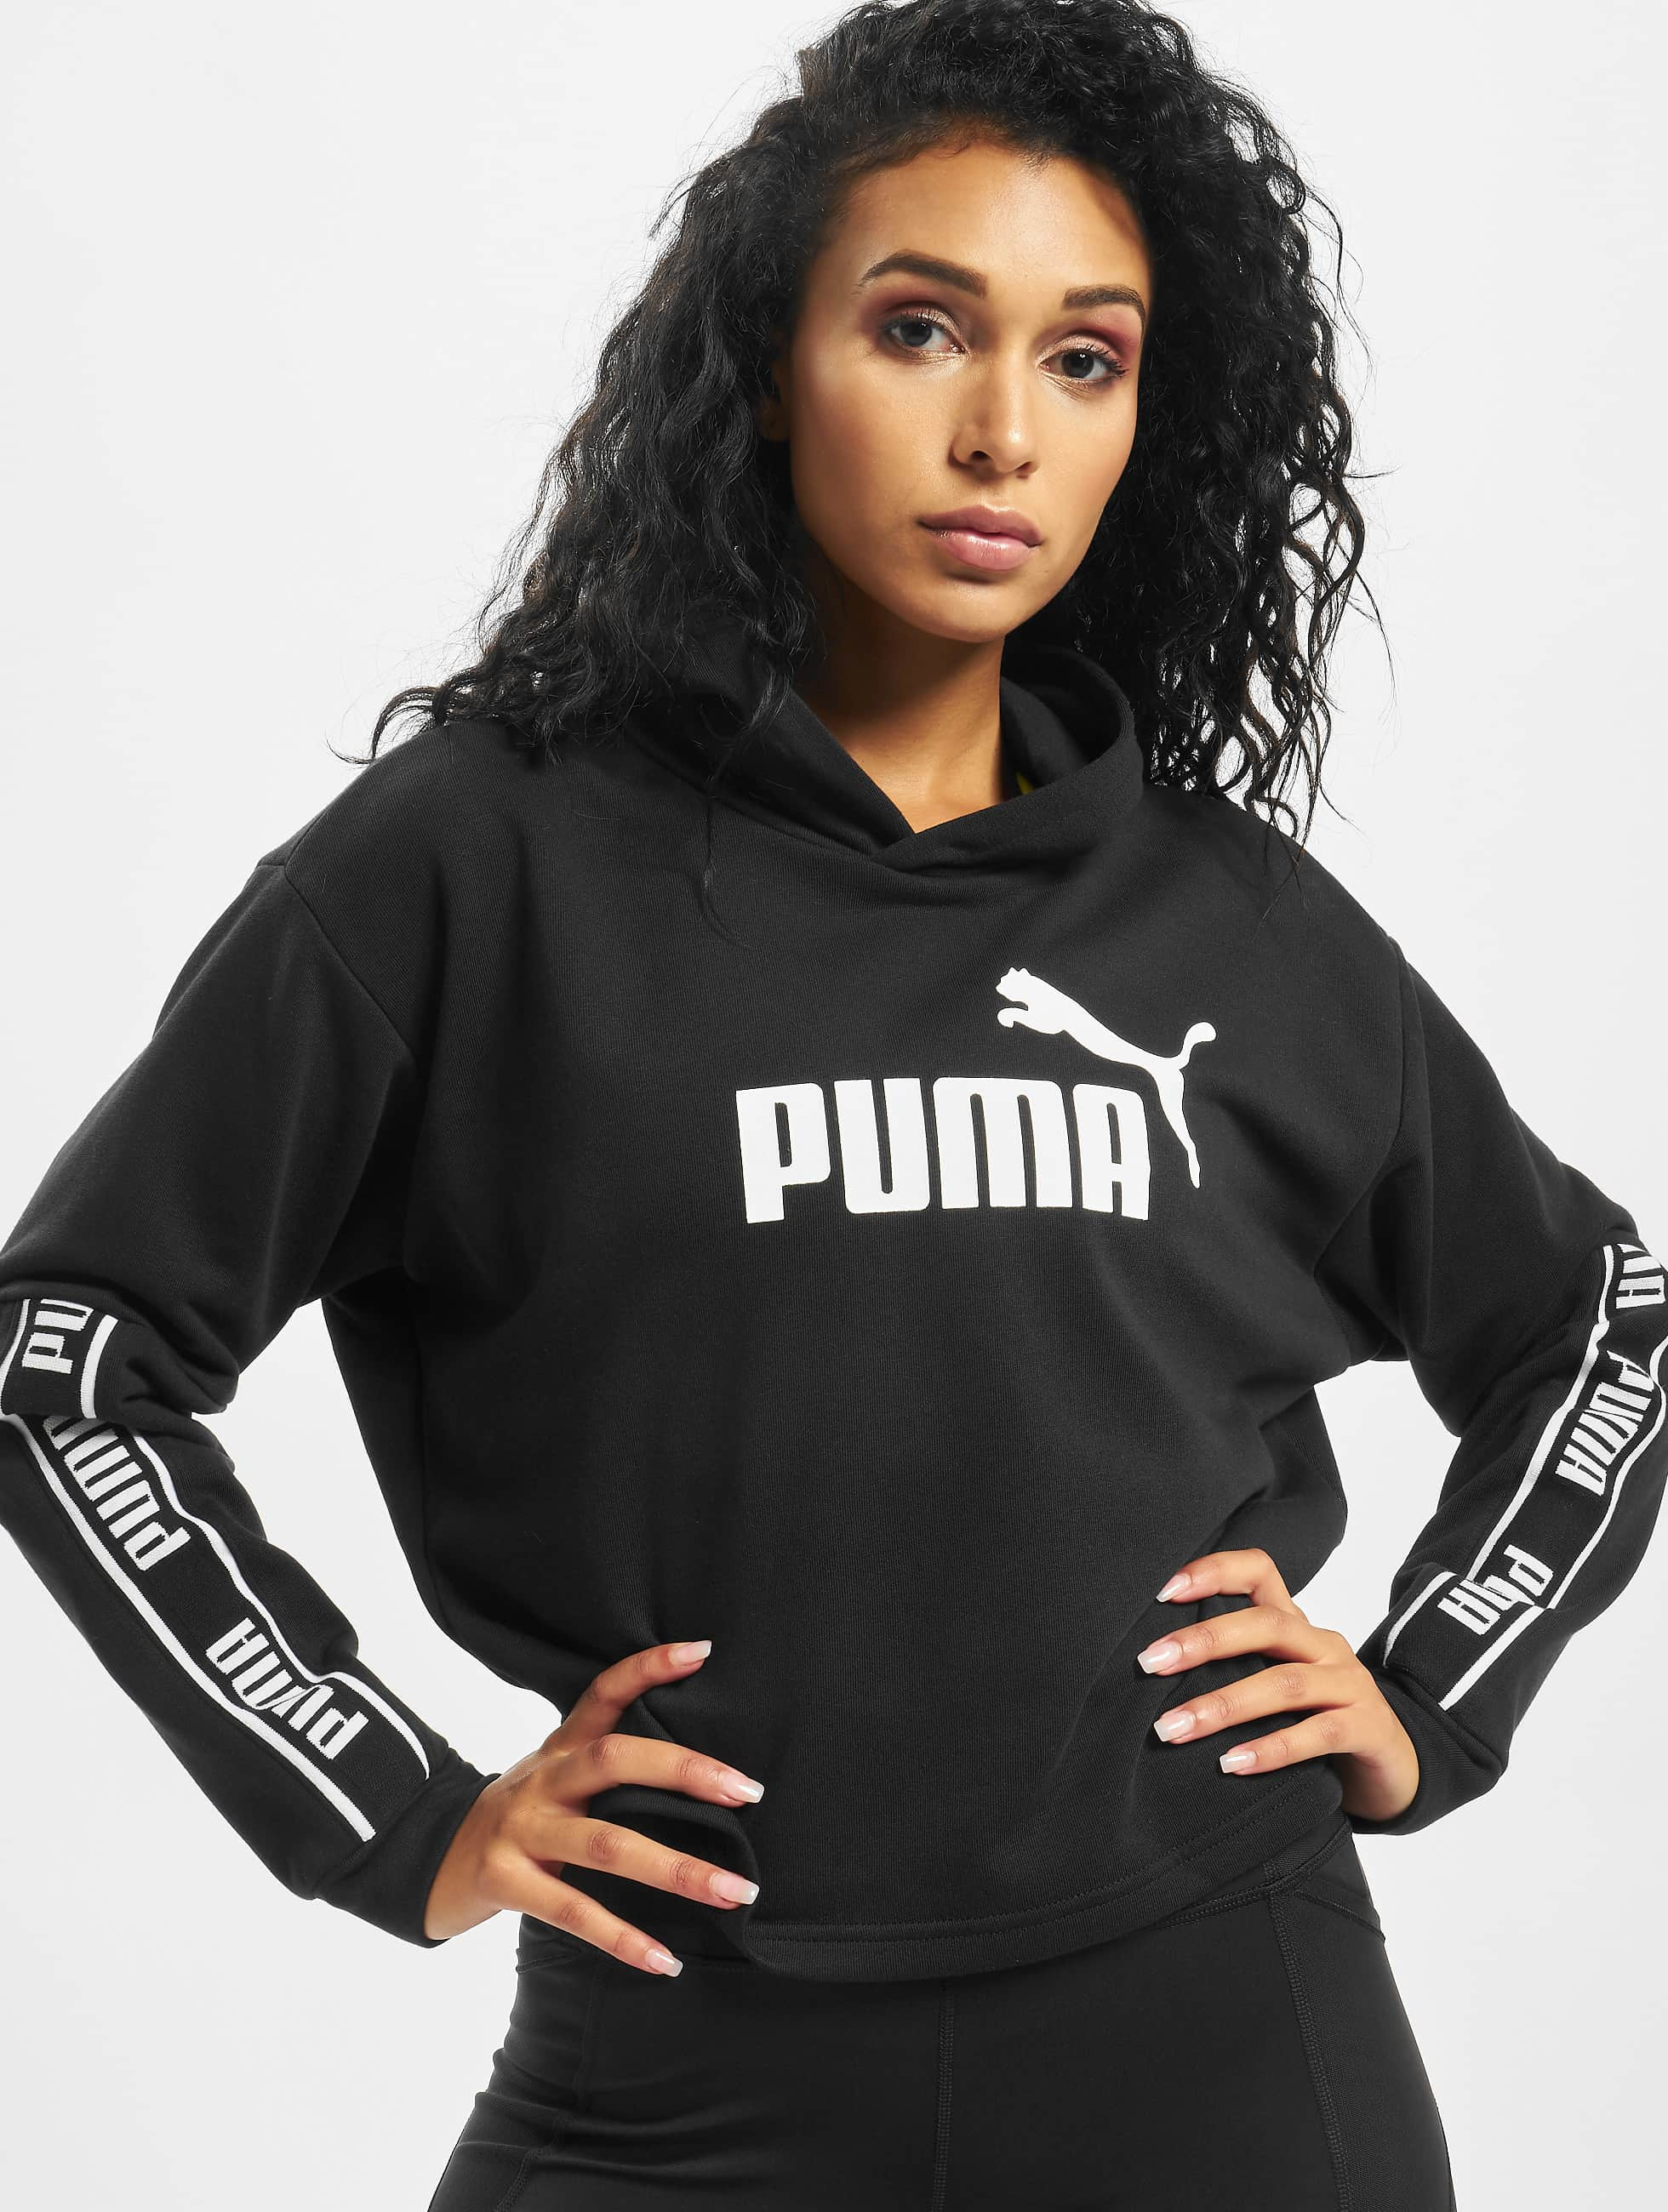 Puma Amplified Cropped Hoody Puma Black